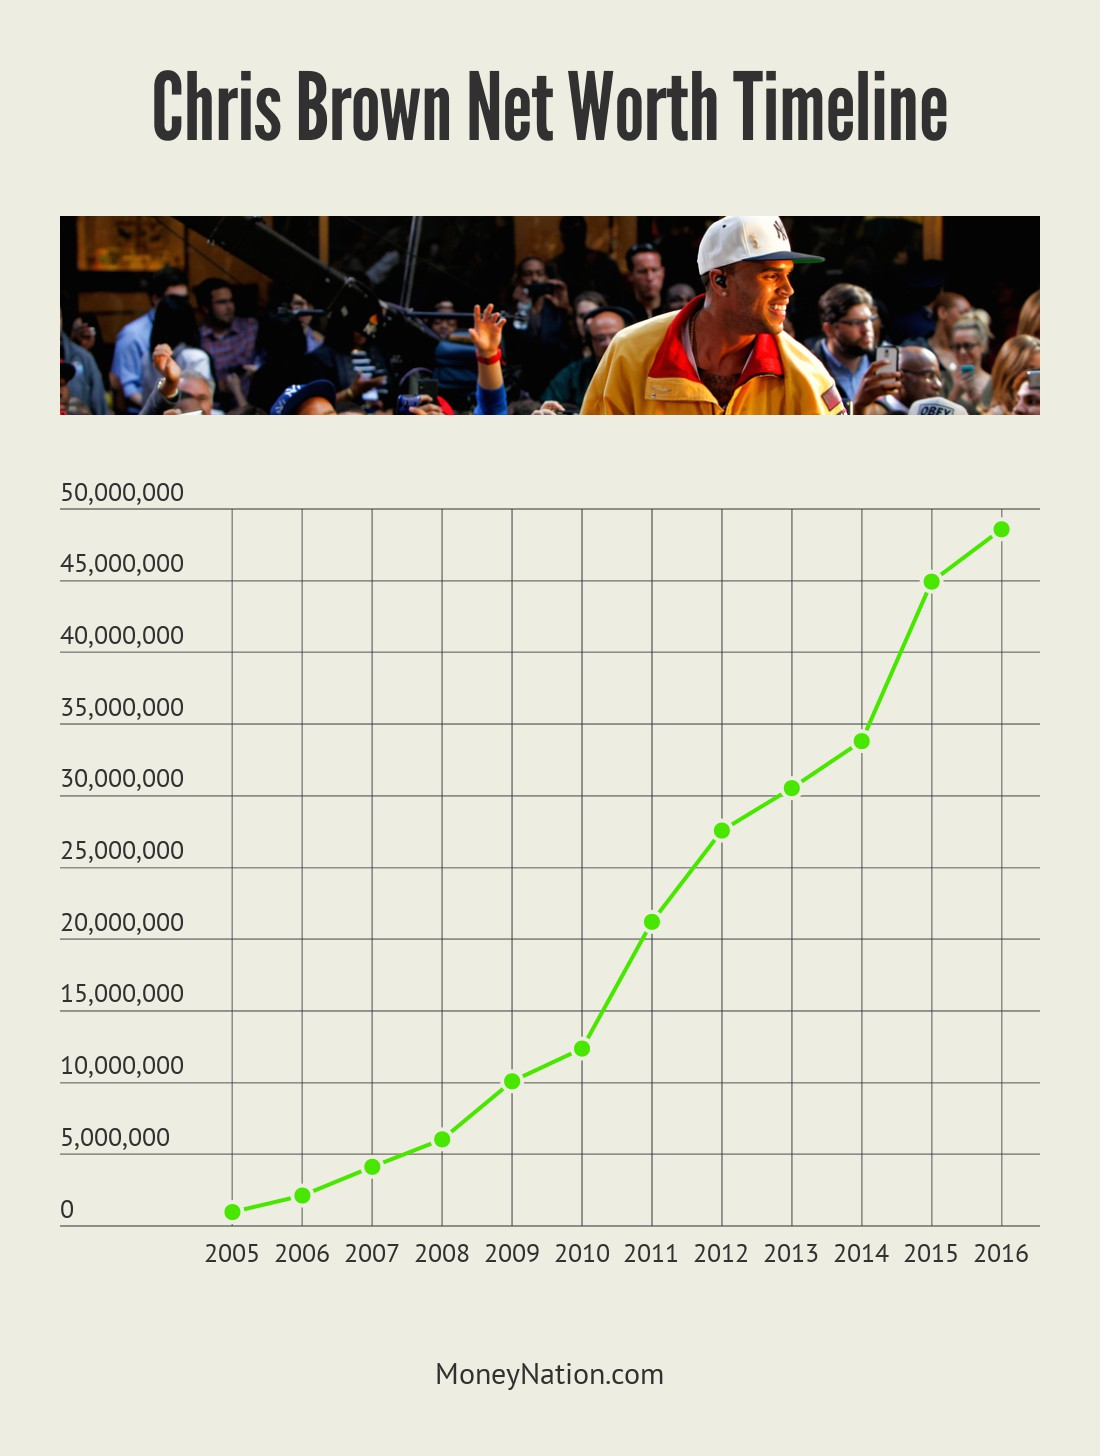 Chris Brown Net Worth Timeline